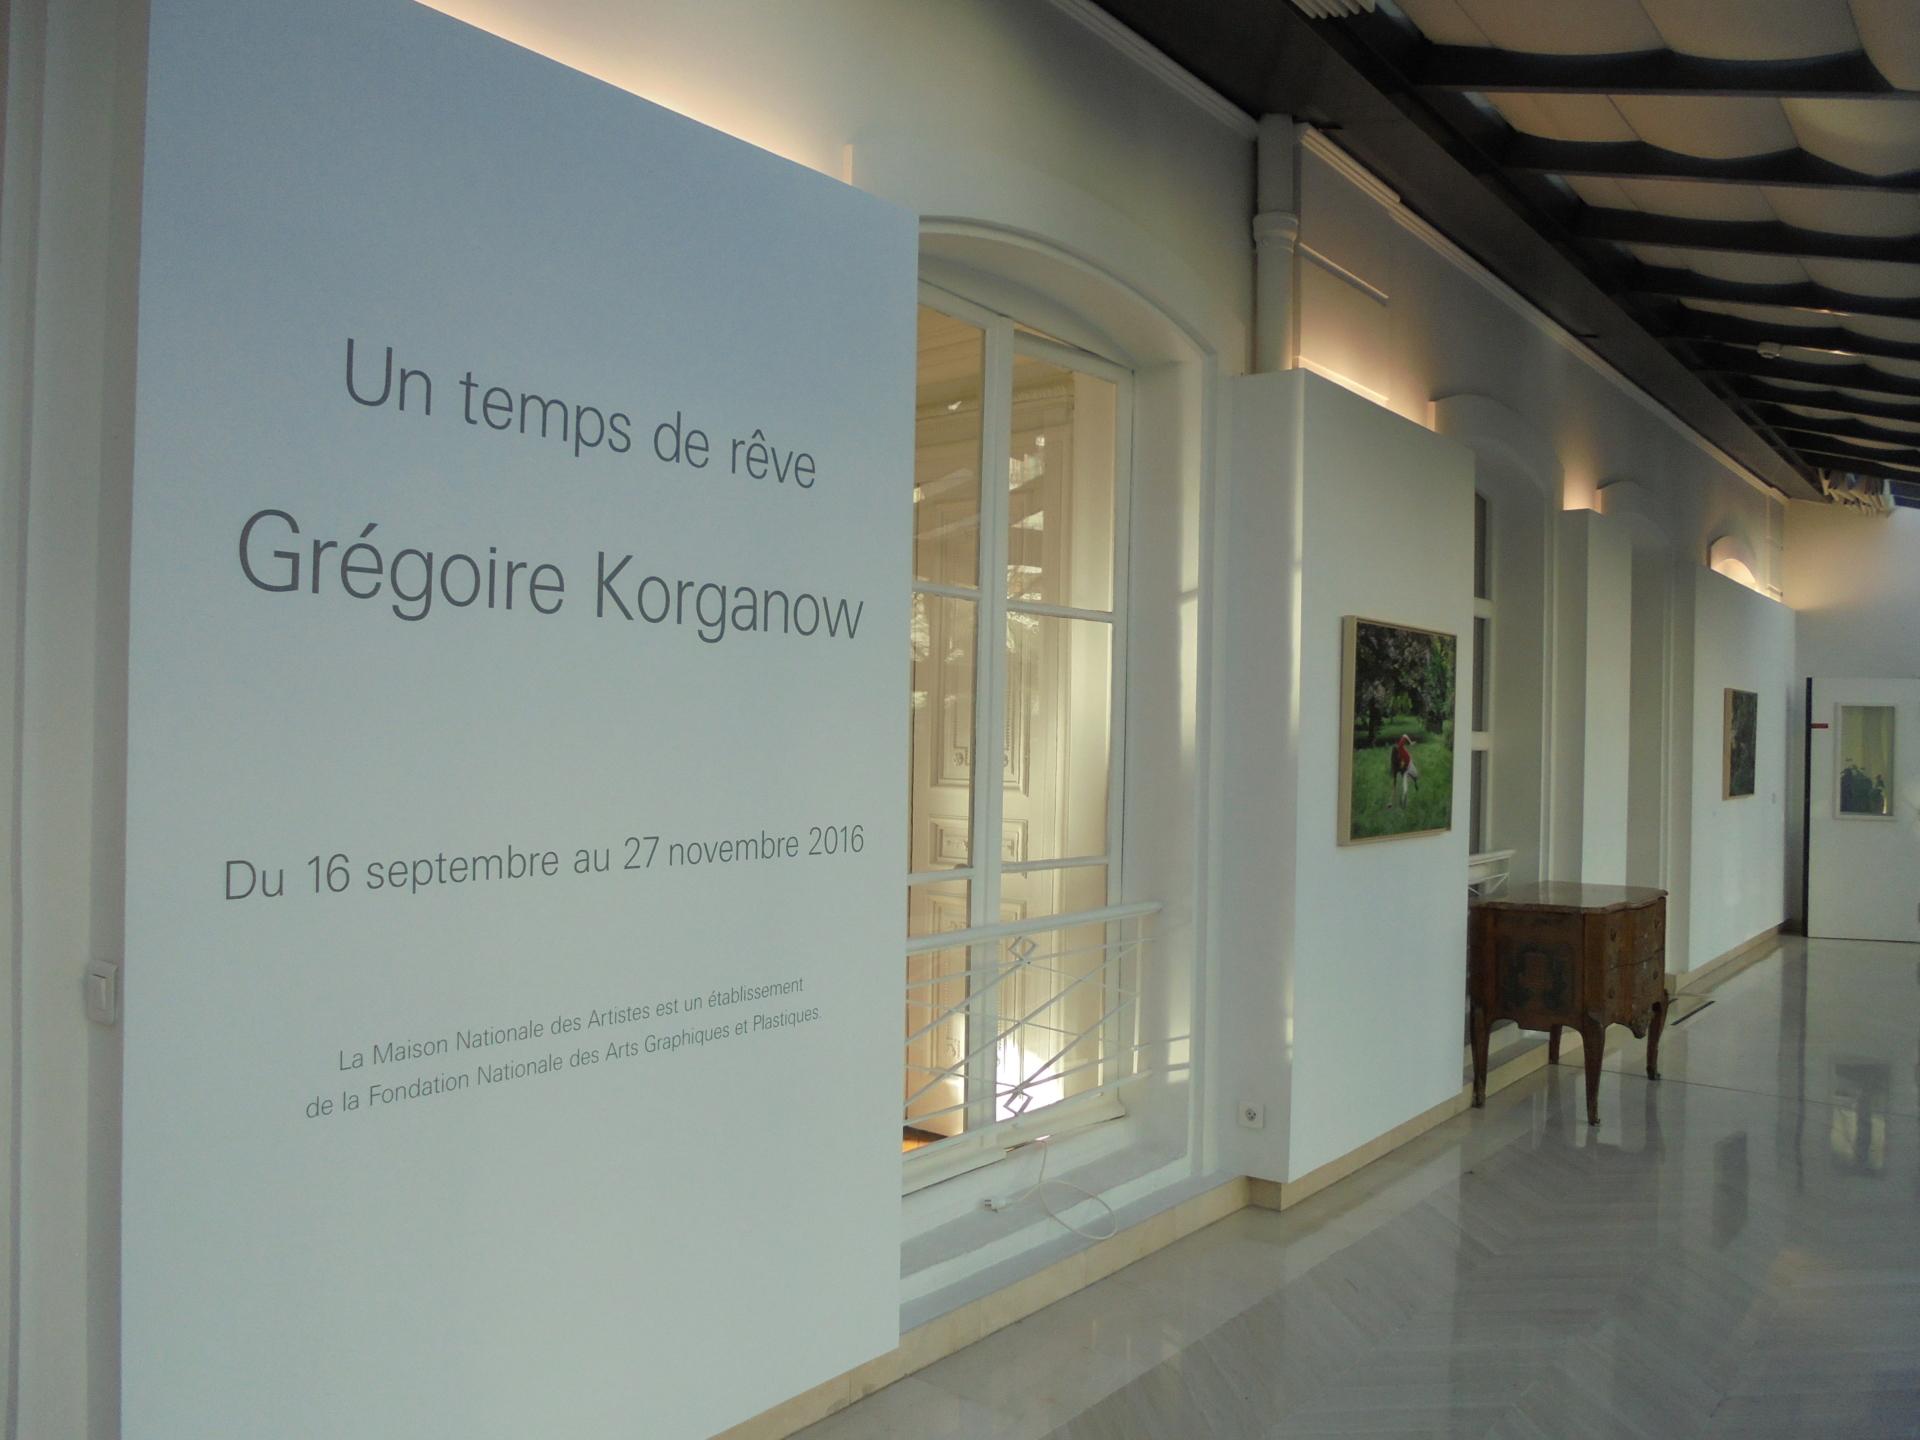 Vues de l'exposition G. KORGANOW (3)